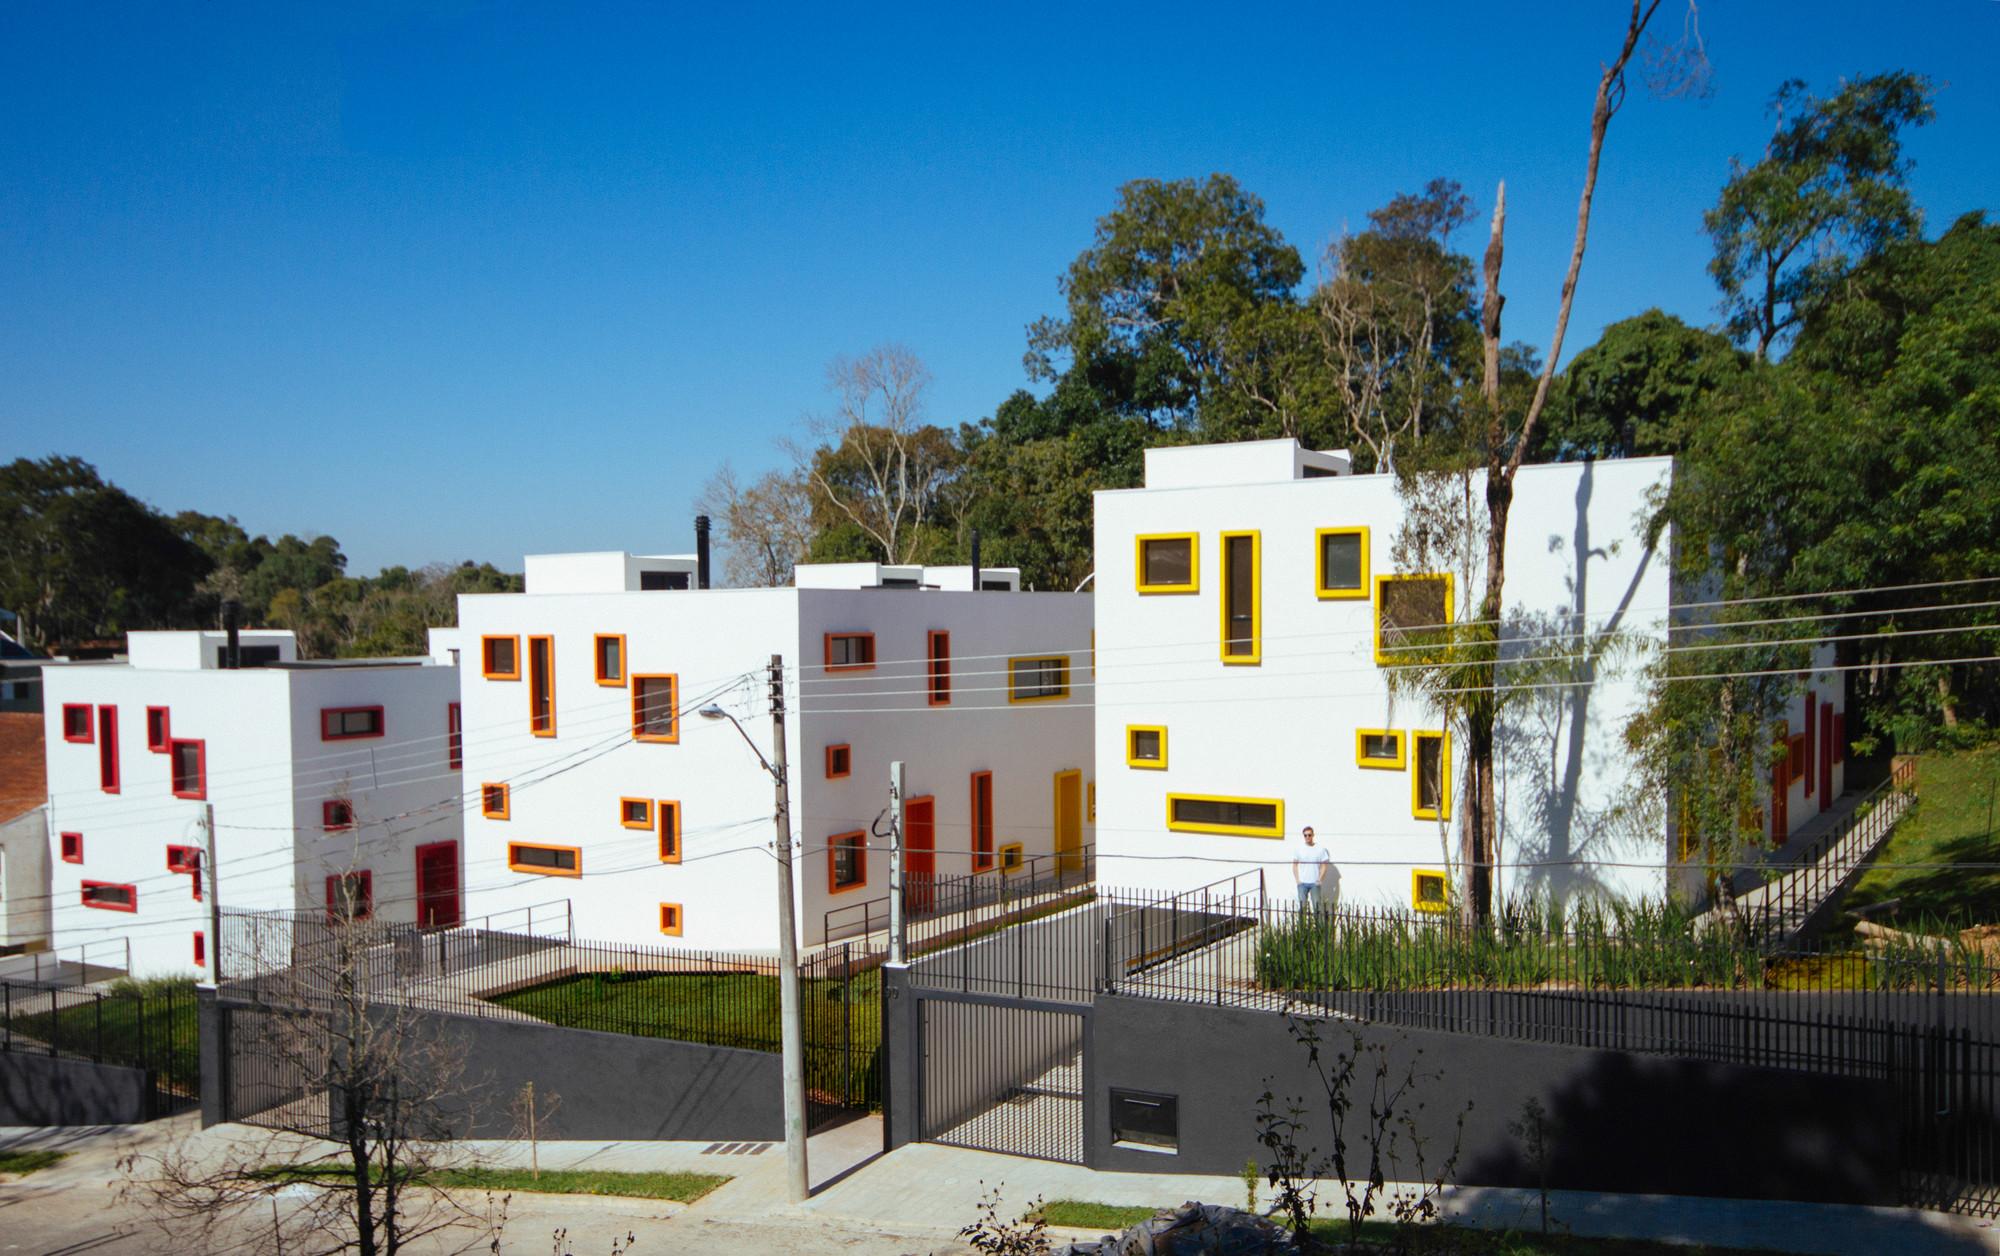 Casas Cubo / Aleph Zero + Studio Juliano Monteiro, © Felipe Gomes